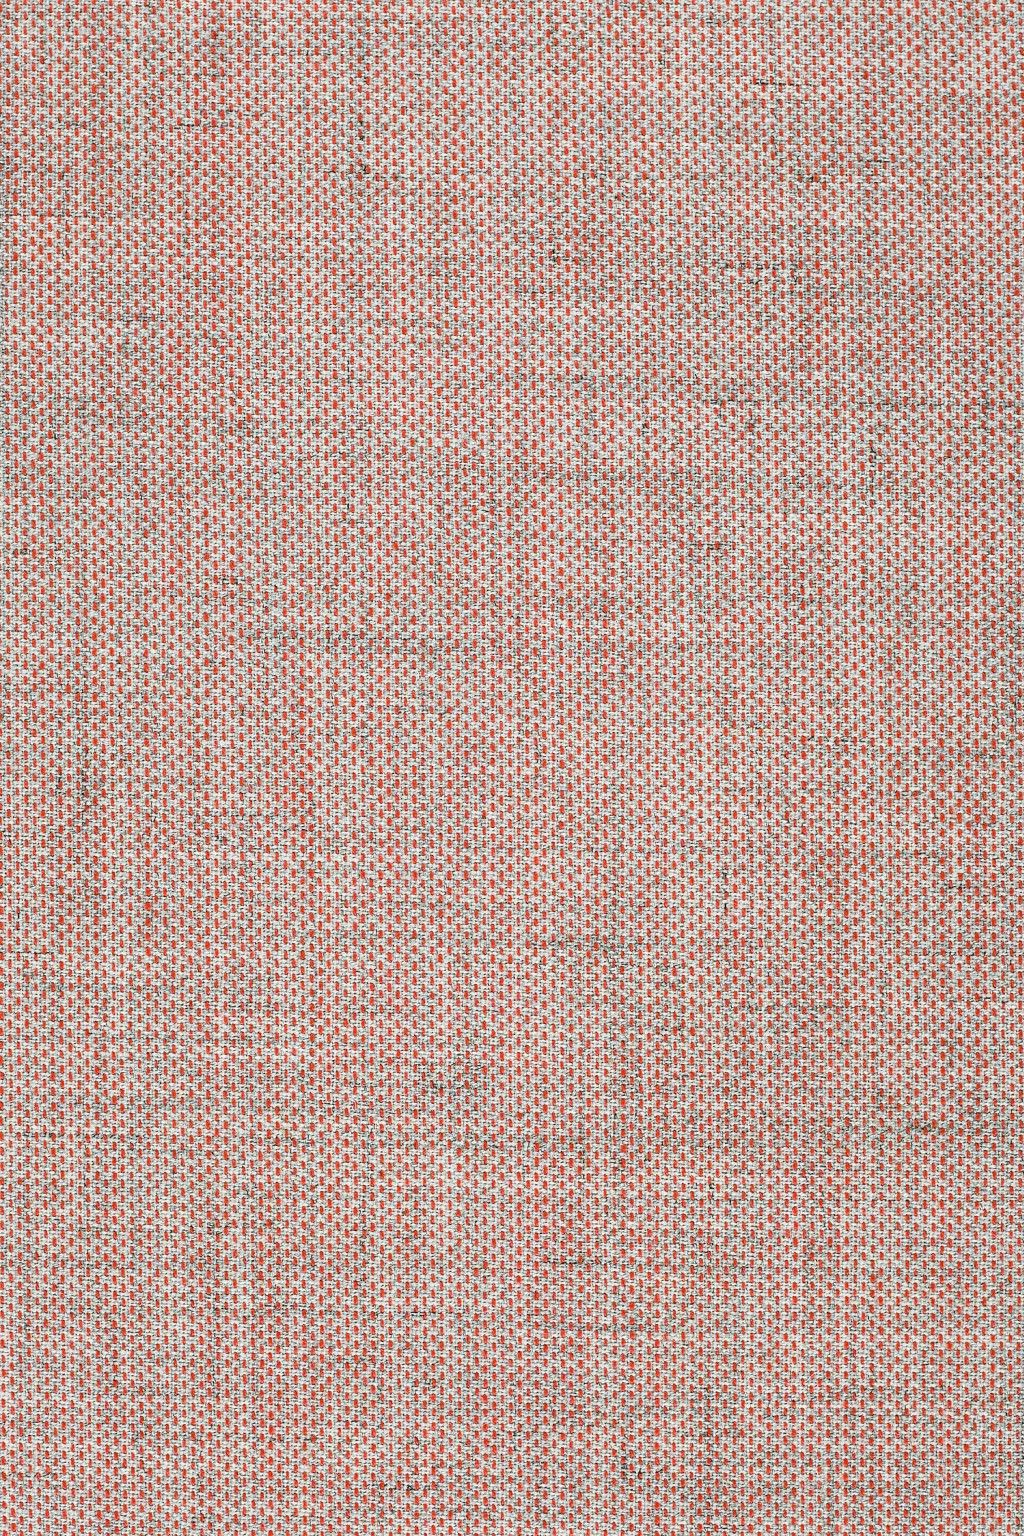 Kvadrat Textiles Kvadrat Is Europe's Leading Manufacturer Of Design Textileswe .